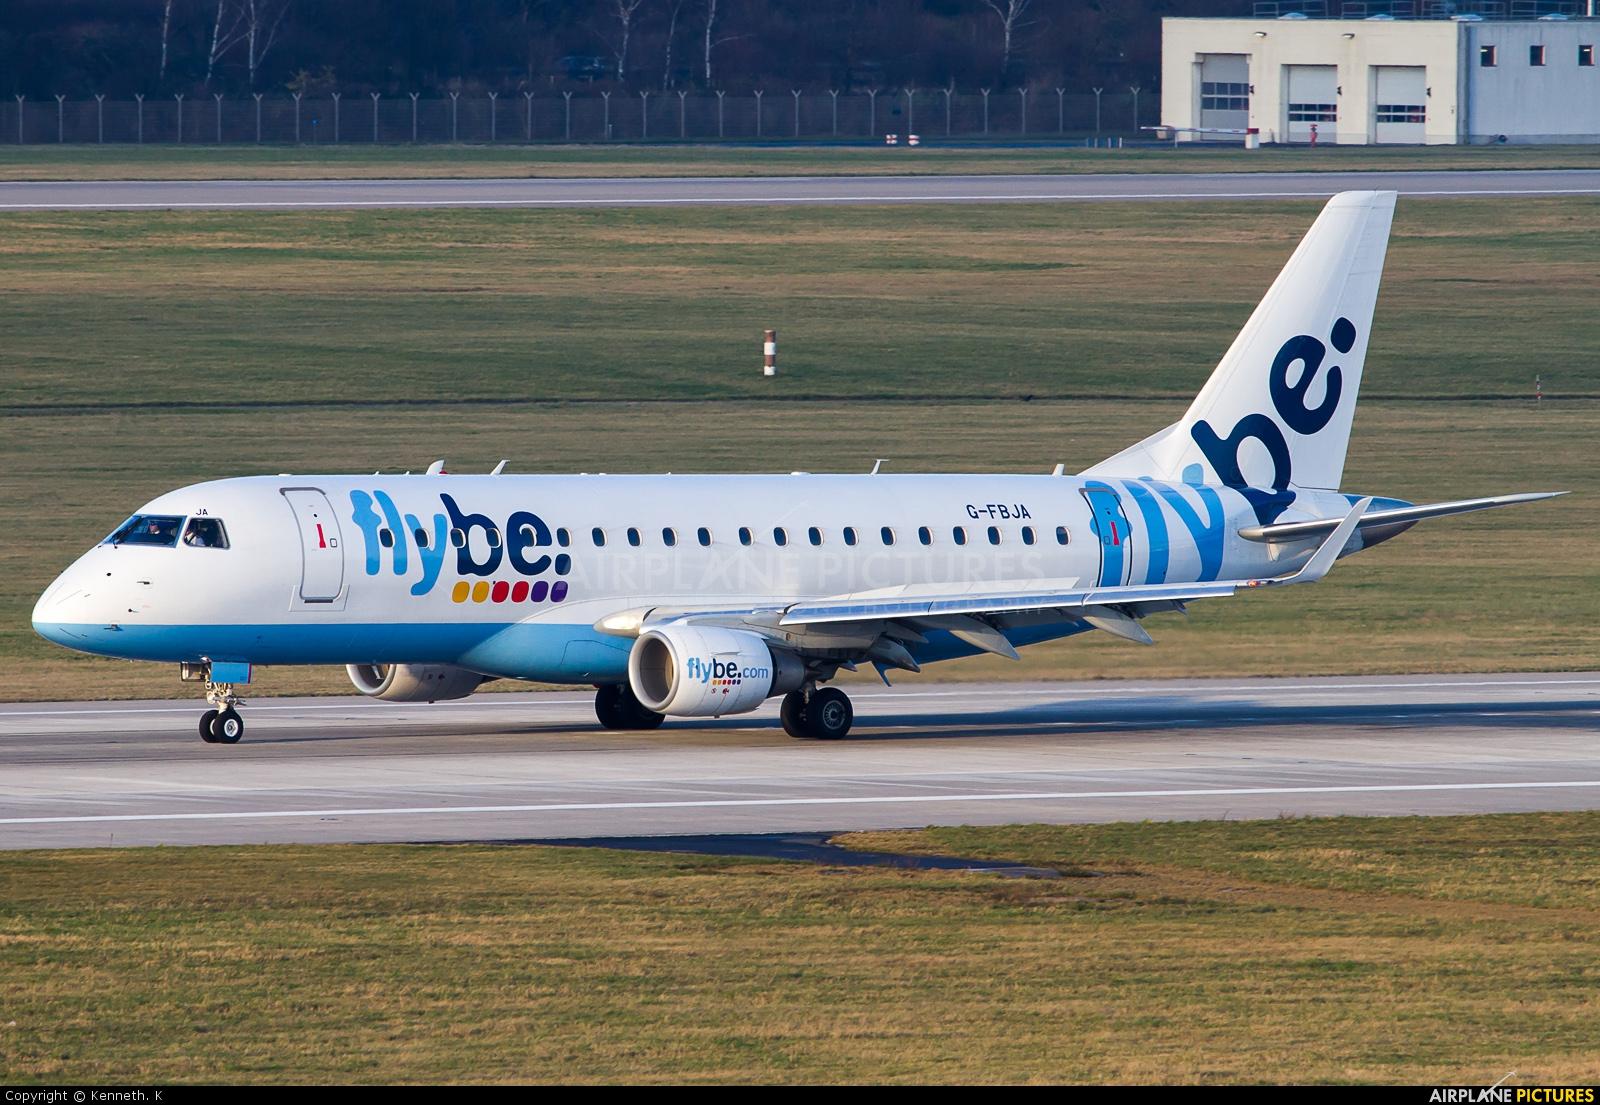 G-FBJA - Flybe Embraer ERJ-175 (170-200) at Düsseldorf ... - photo#40